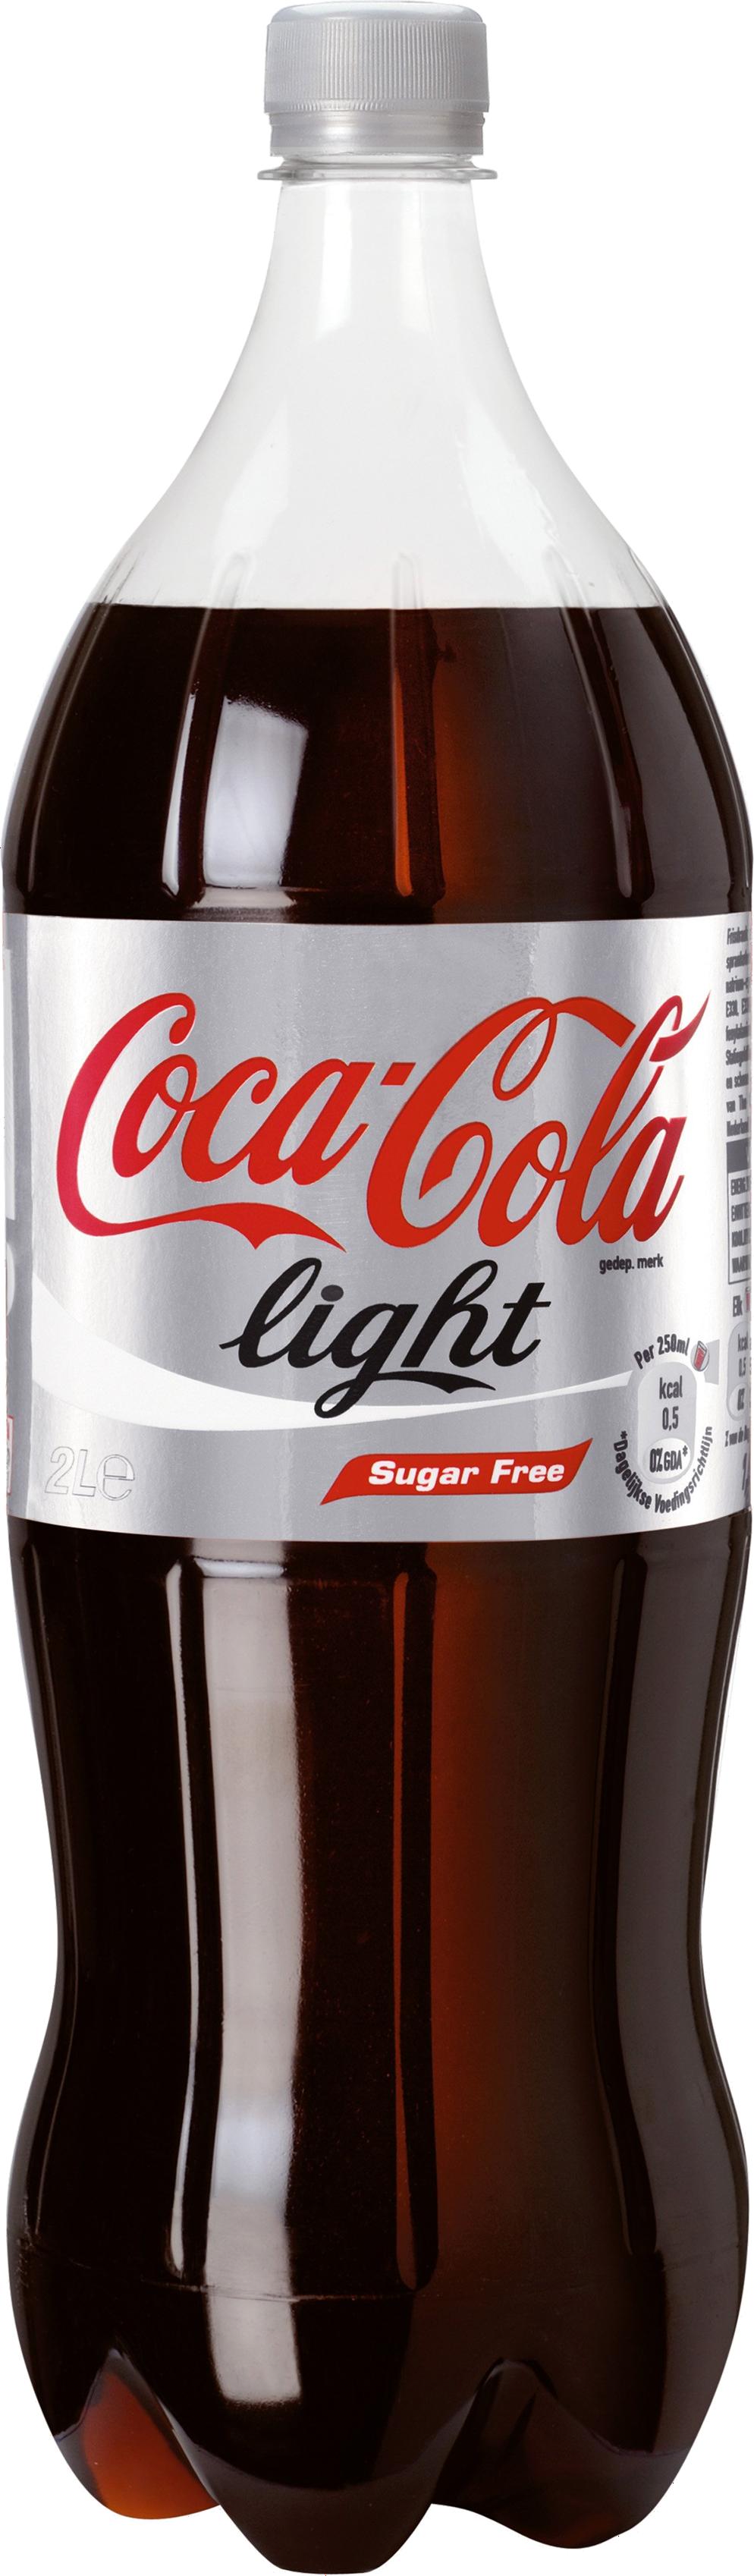 Drinks clipart cold drink bottle. Coca cola png image